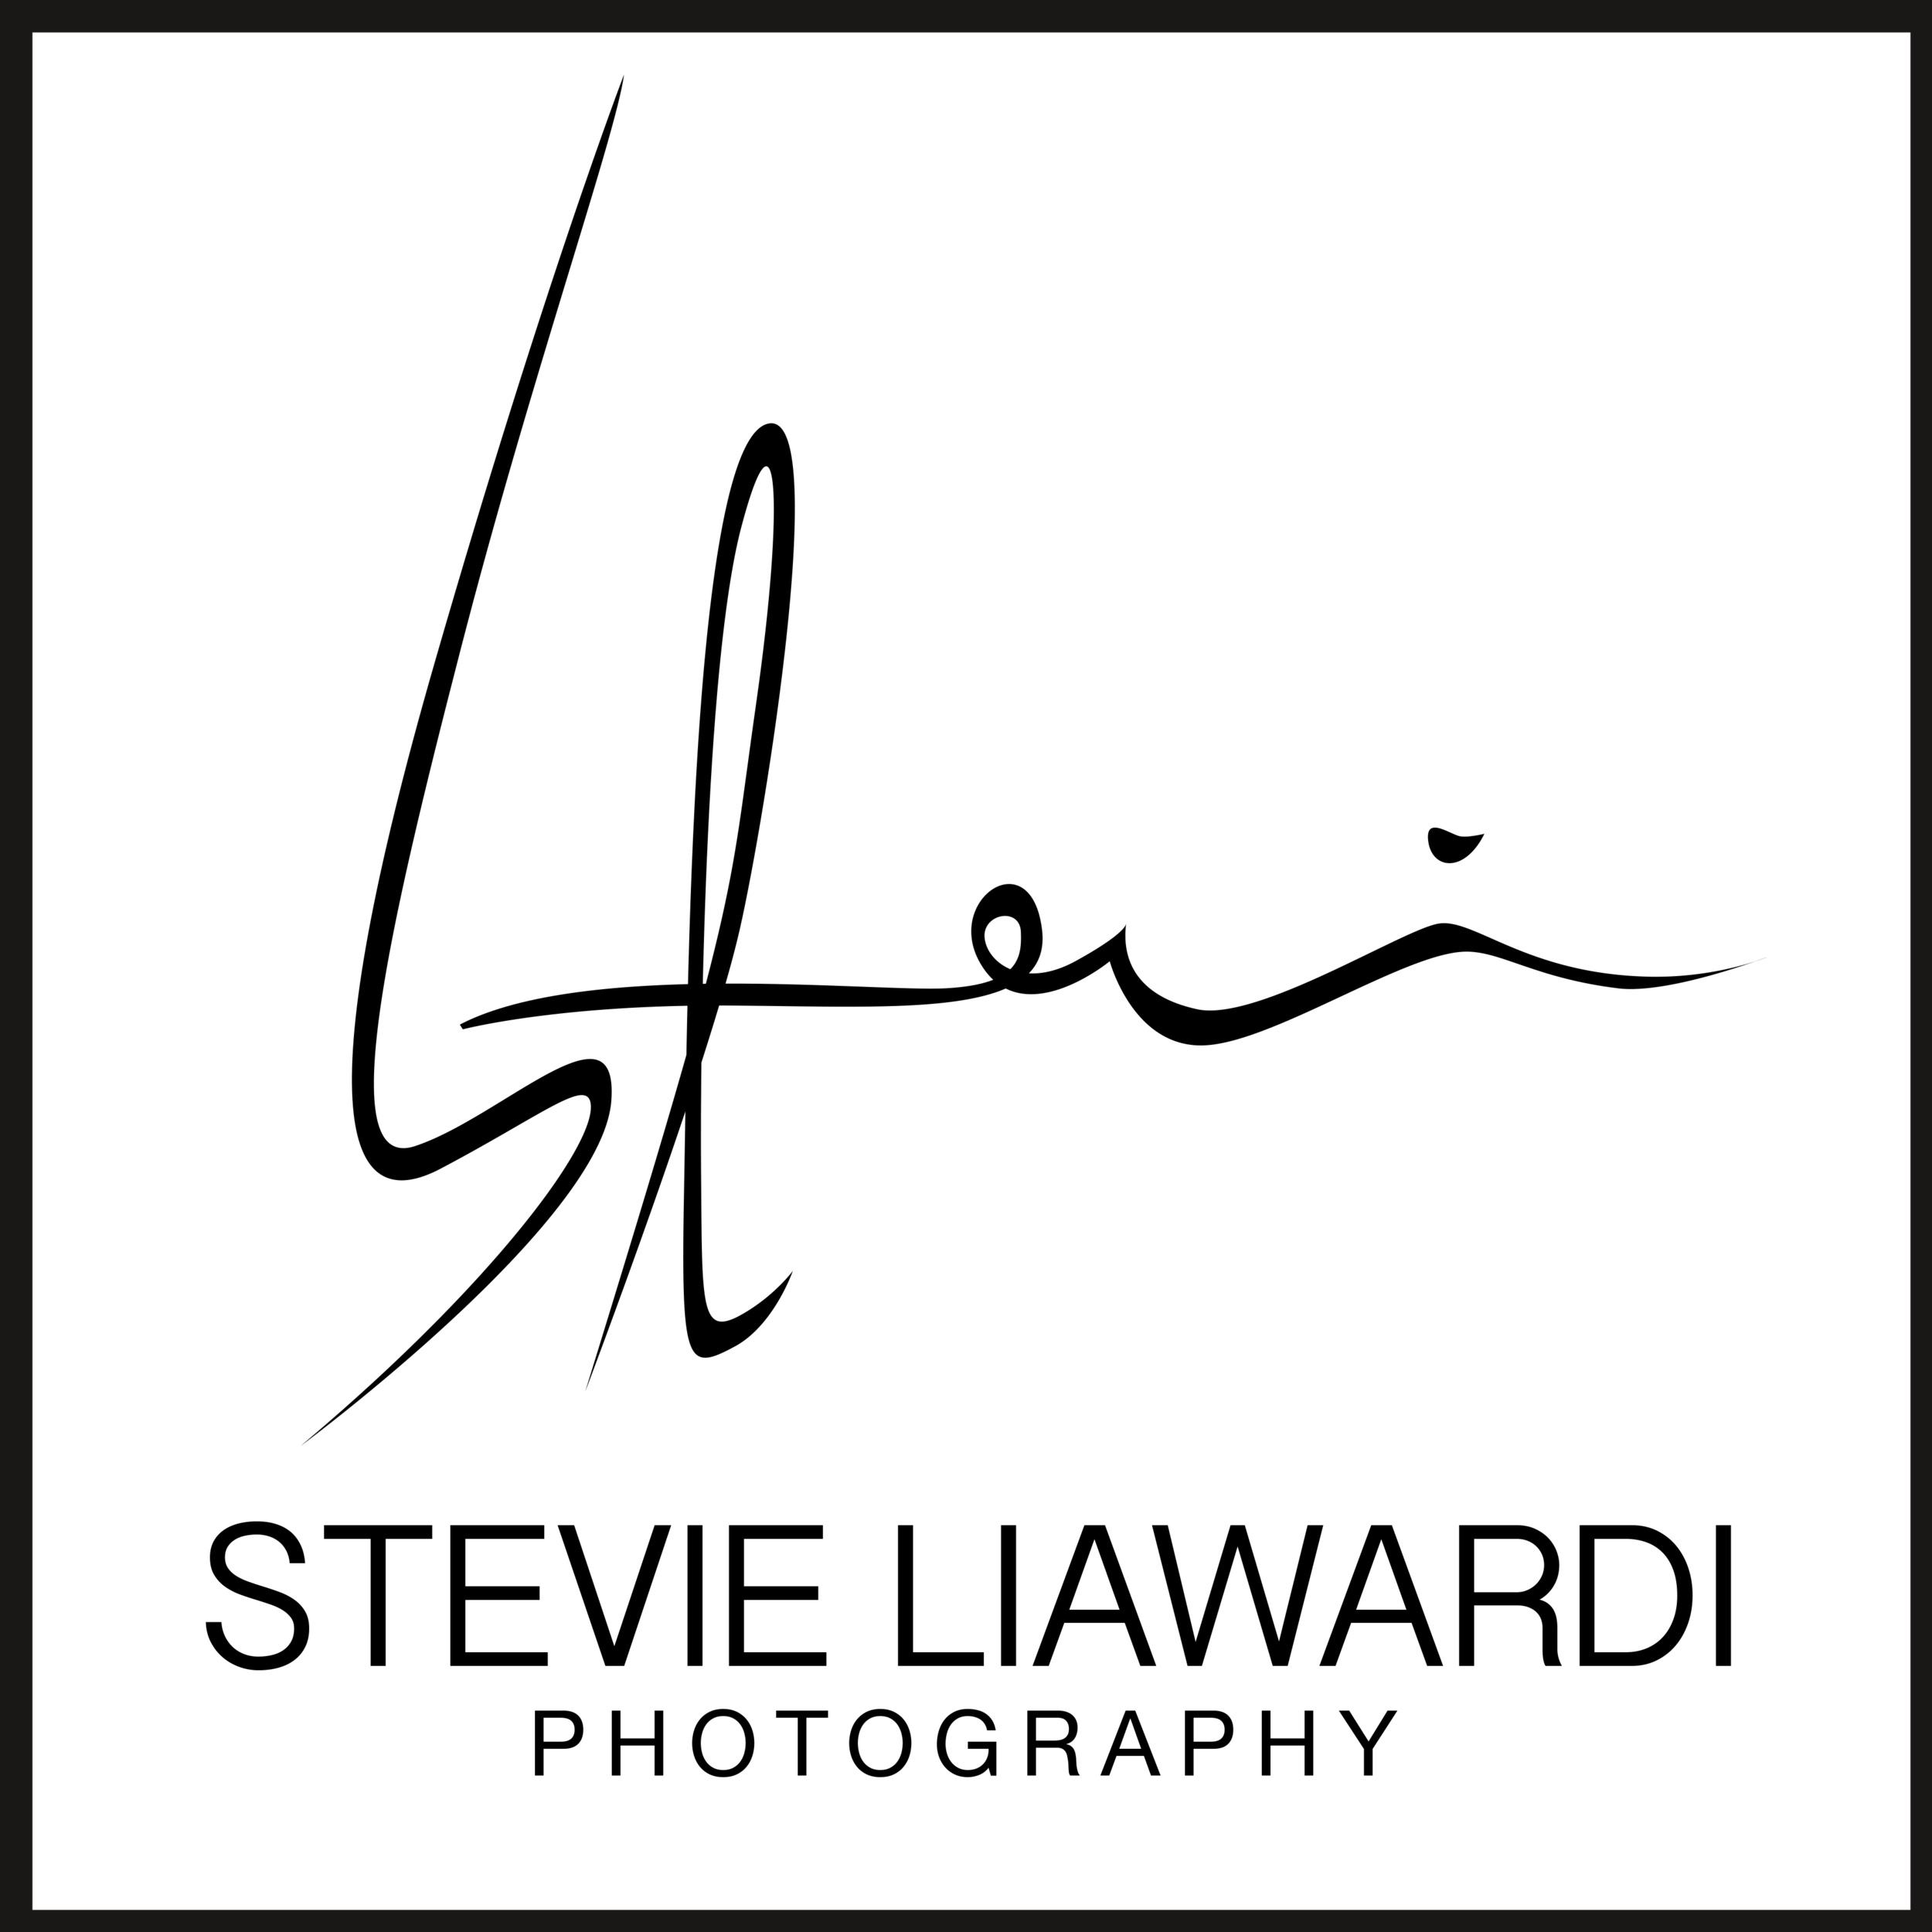 logo stevie liawardi black.png